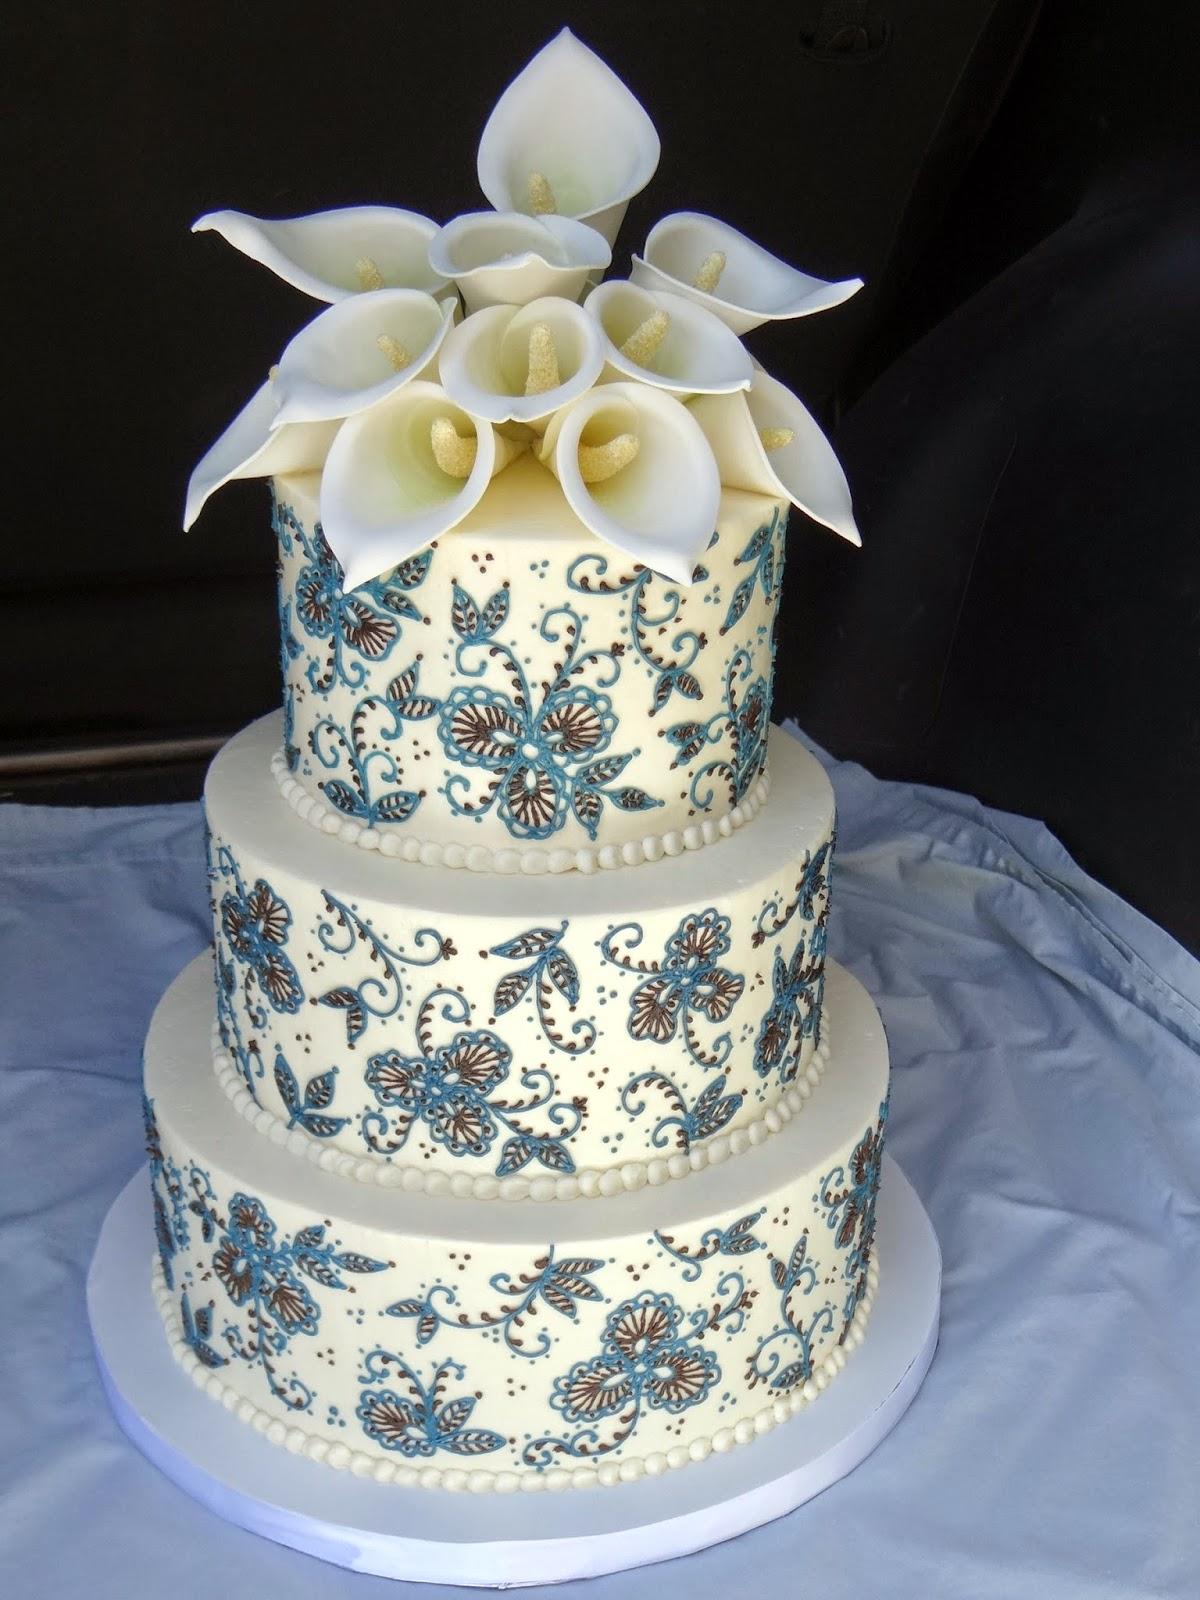 Tiers of Joy Cakery Calla Lily Wedding Cake